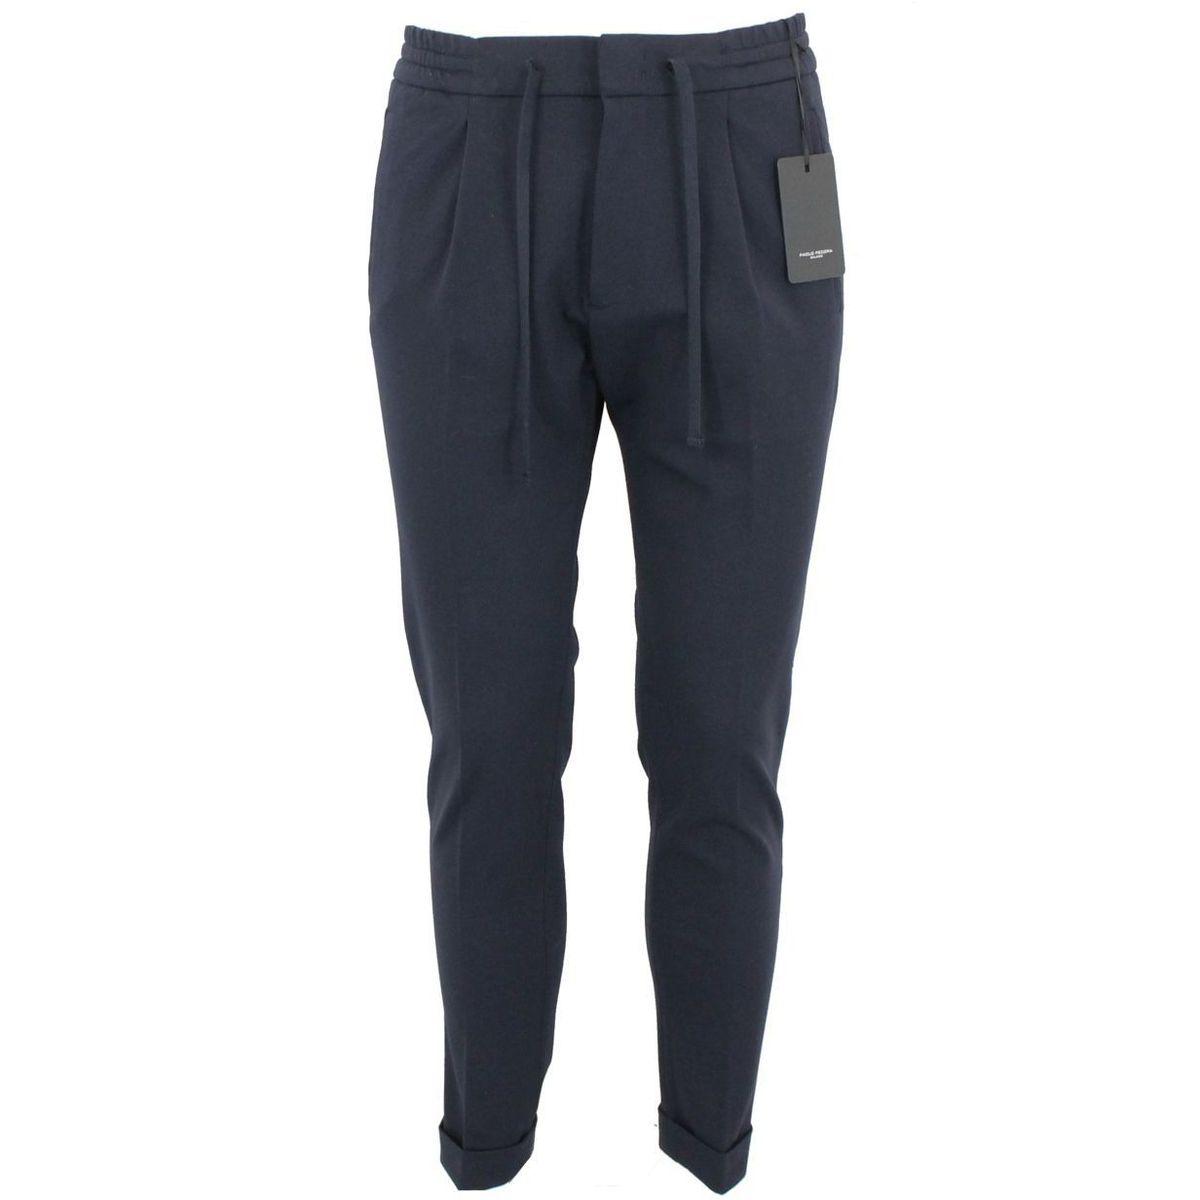 Pantalone in tessuto Blue Paolo Pecora Milano